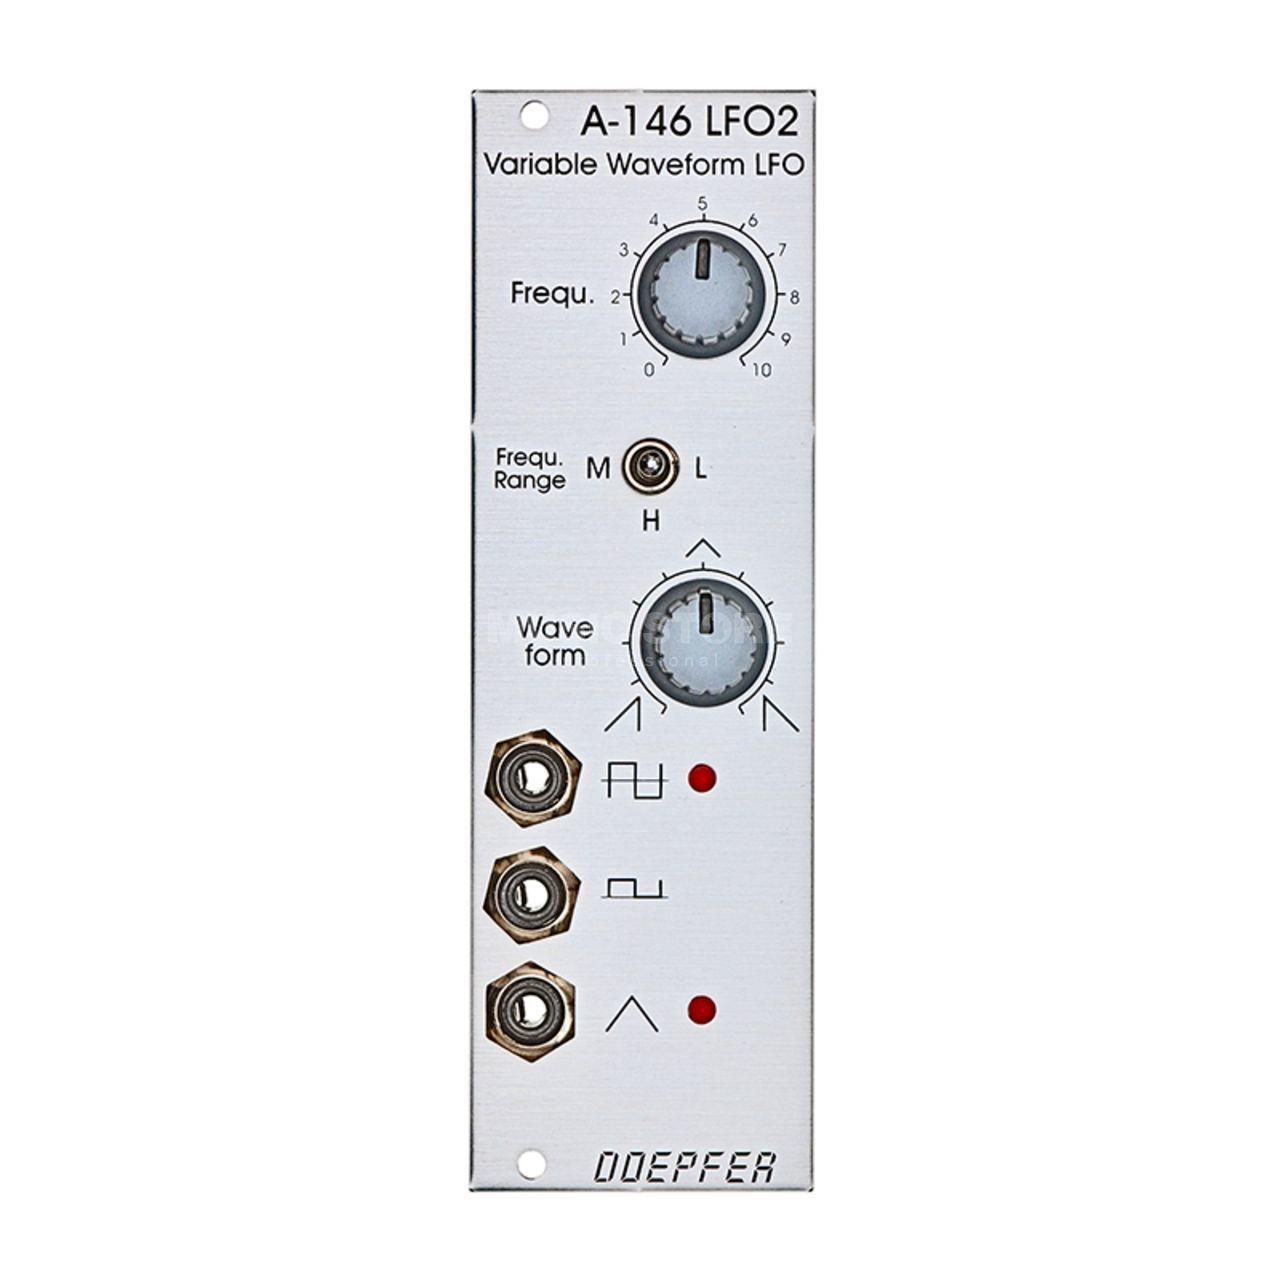 doepfer a 146 low frequency oscillator 2 music store professional de de. Black Bedroom Furniture Sets. Home Design Ideas